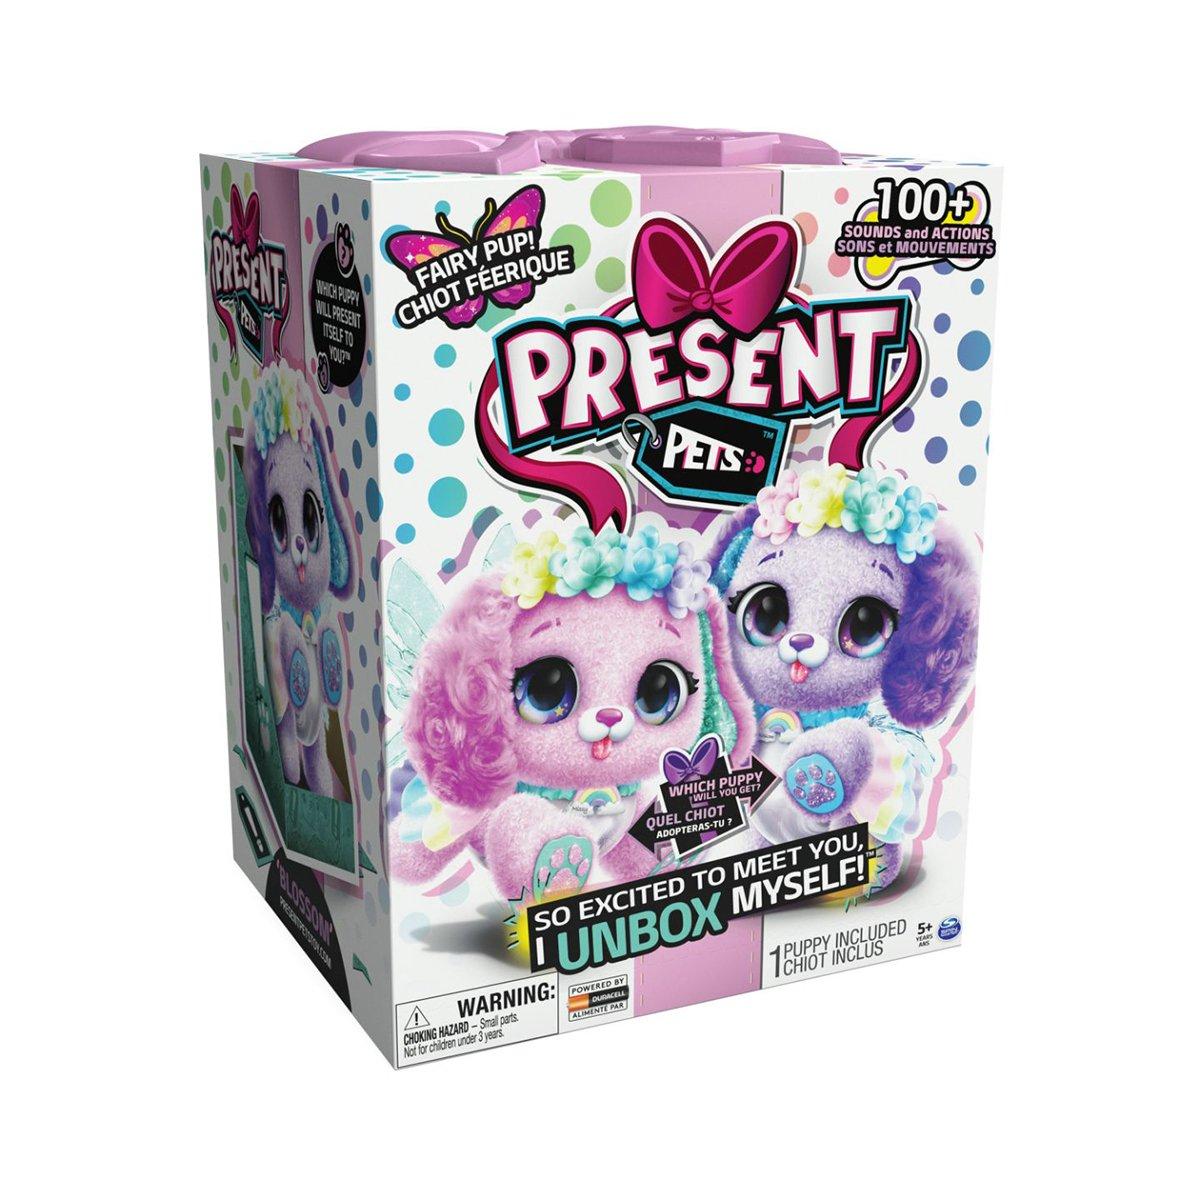 Pachet surpriza, Present Pets, Mini animalut de companie, Rainbowfairy